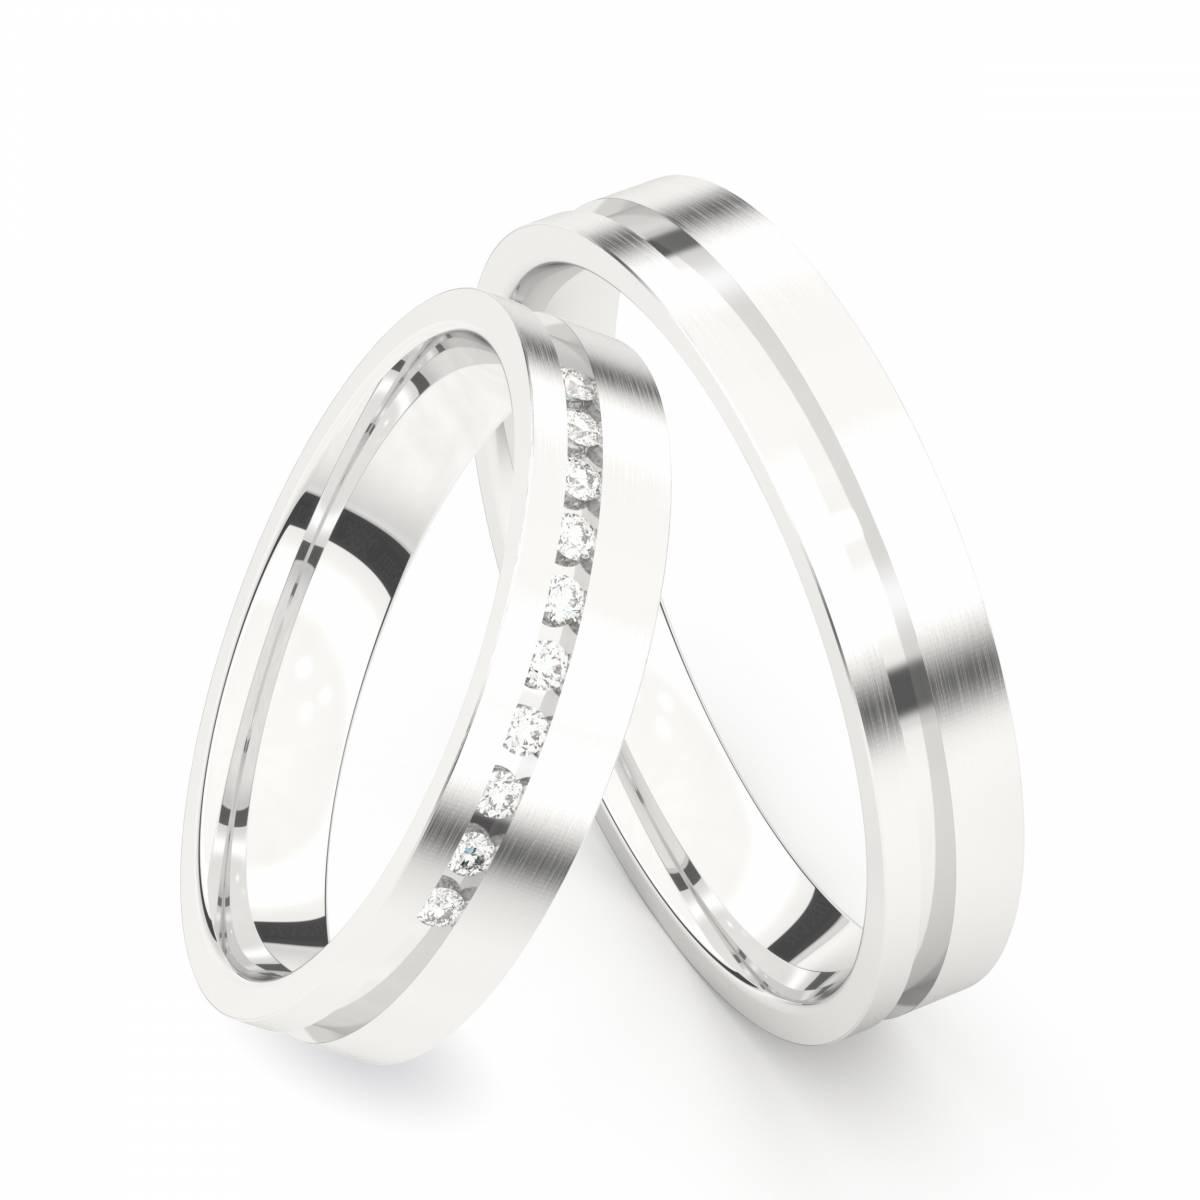 Juwelier Jan Maes - Trouwringen - Verlovingsringen - Juwelen - House of Weddings - 12